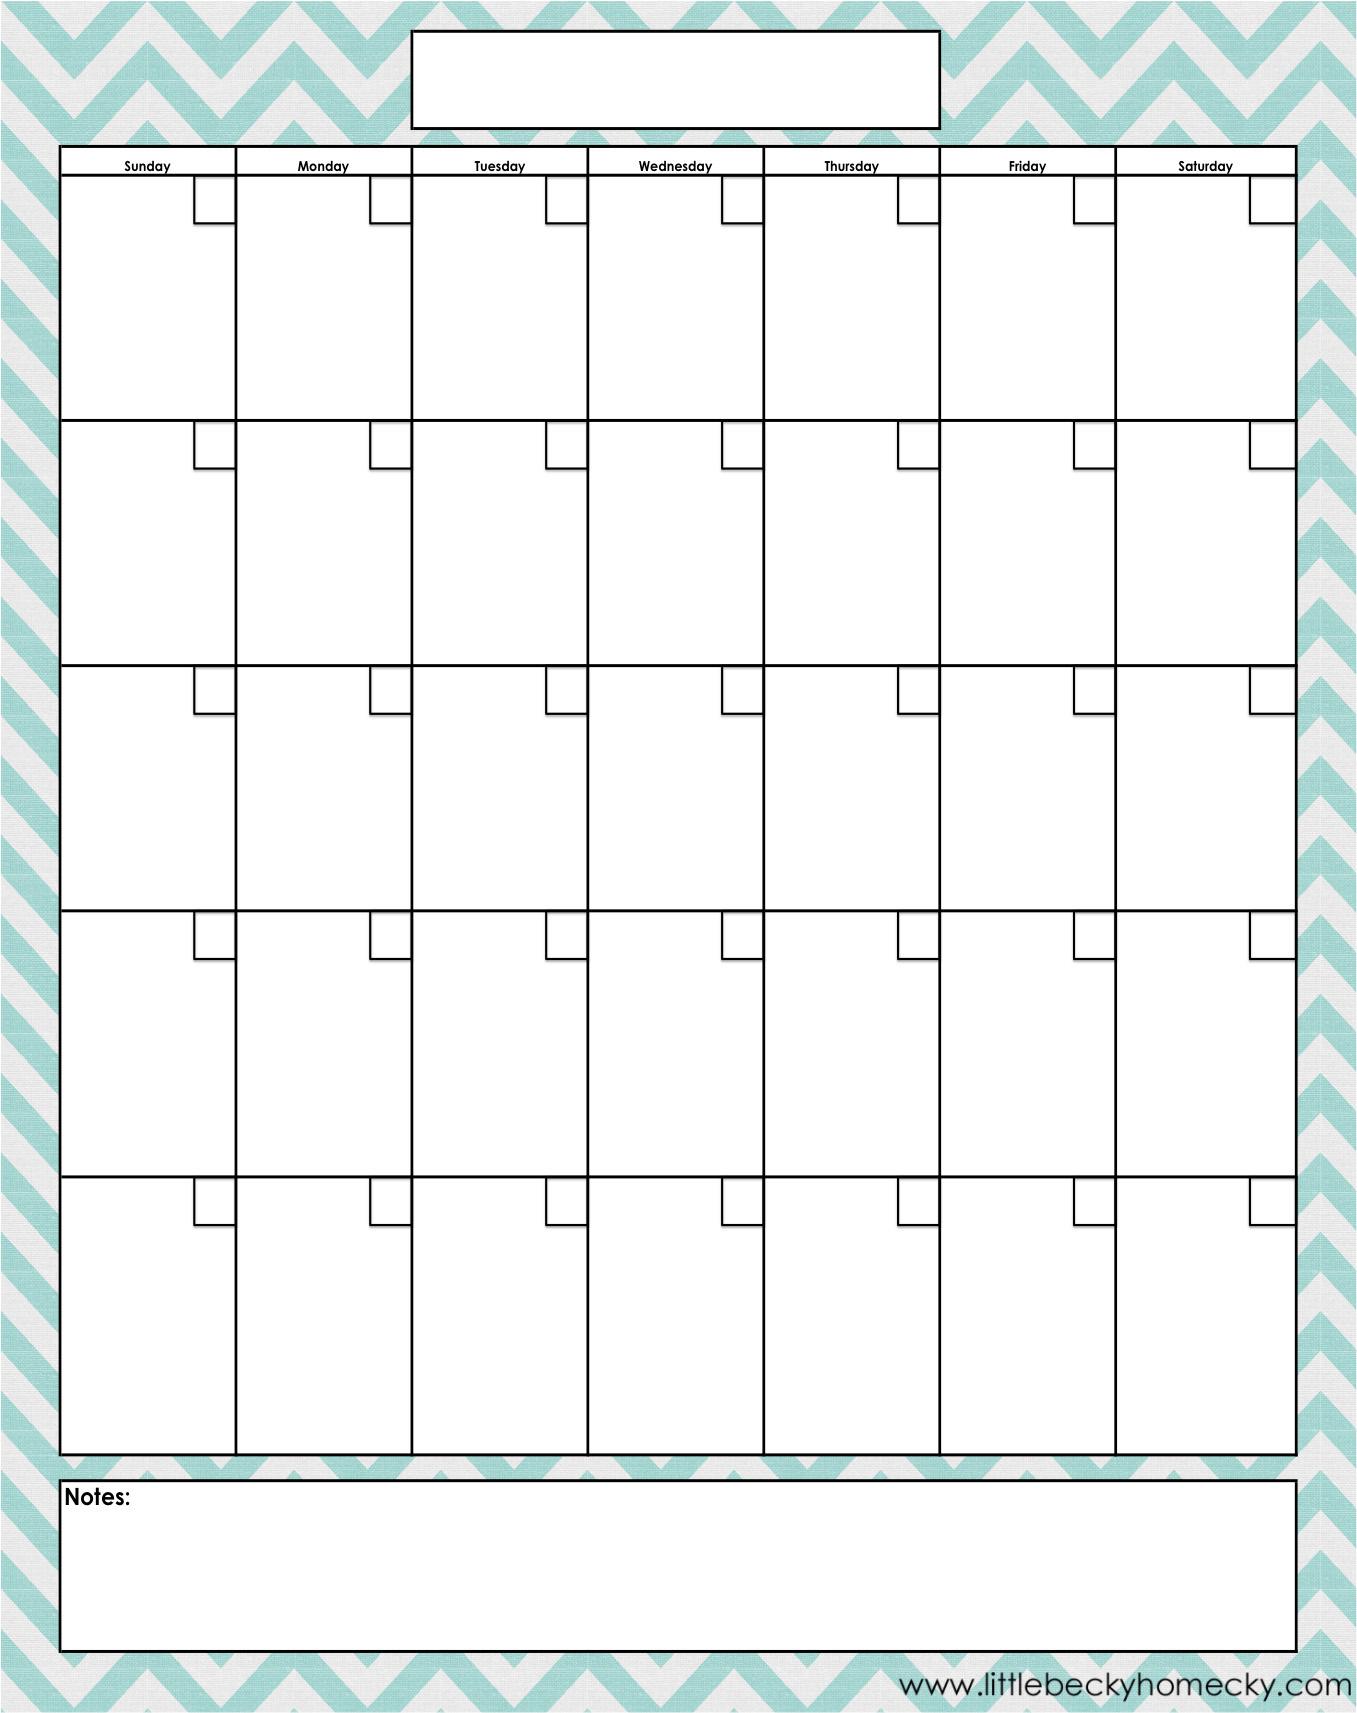 Blank-Monthly-Calendar-Printable-Pdfs throughout Blank Monthly Calendar Print Out